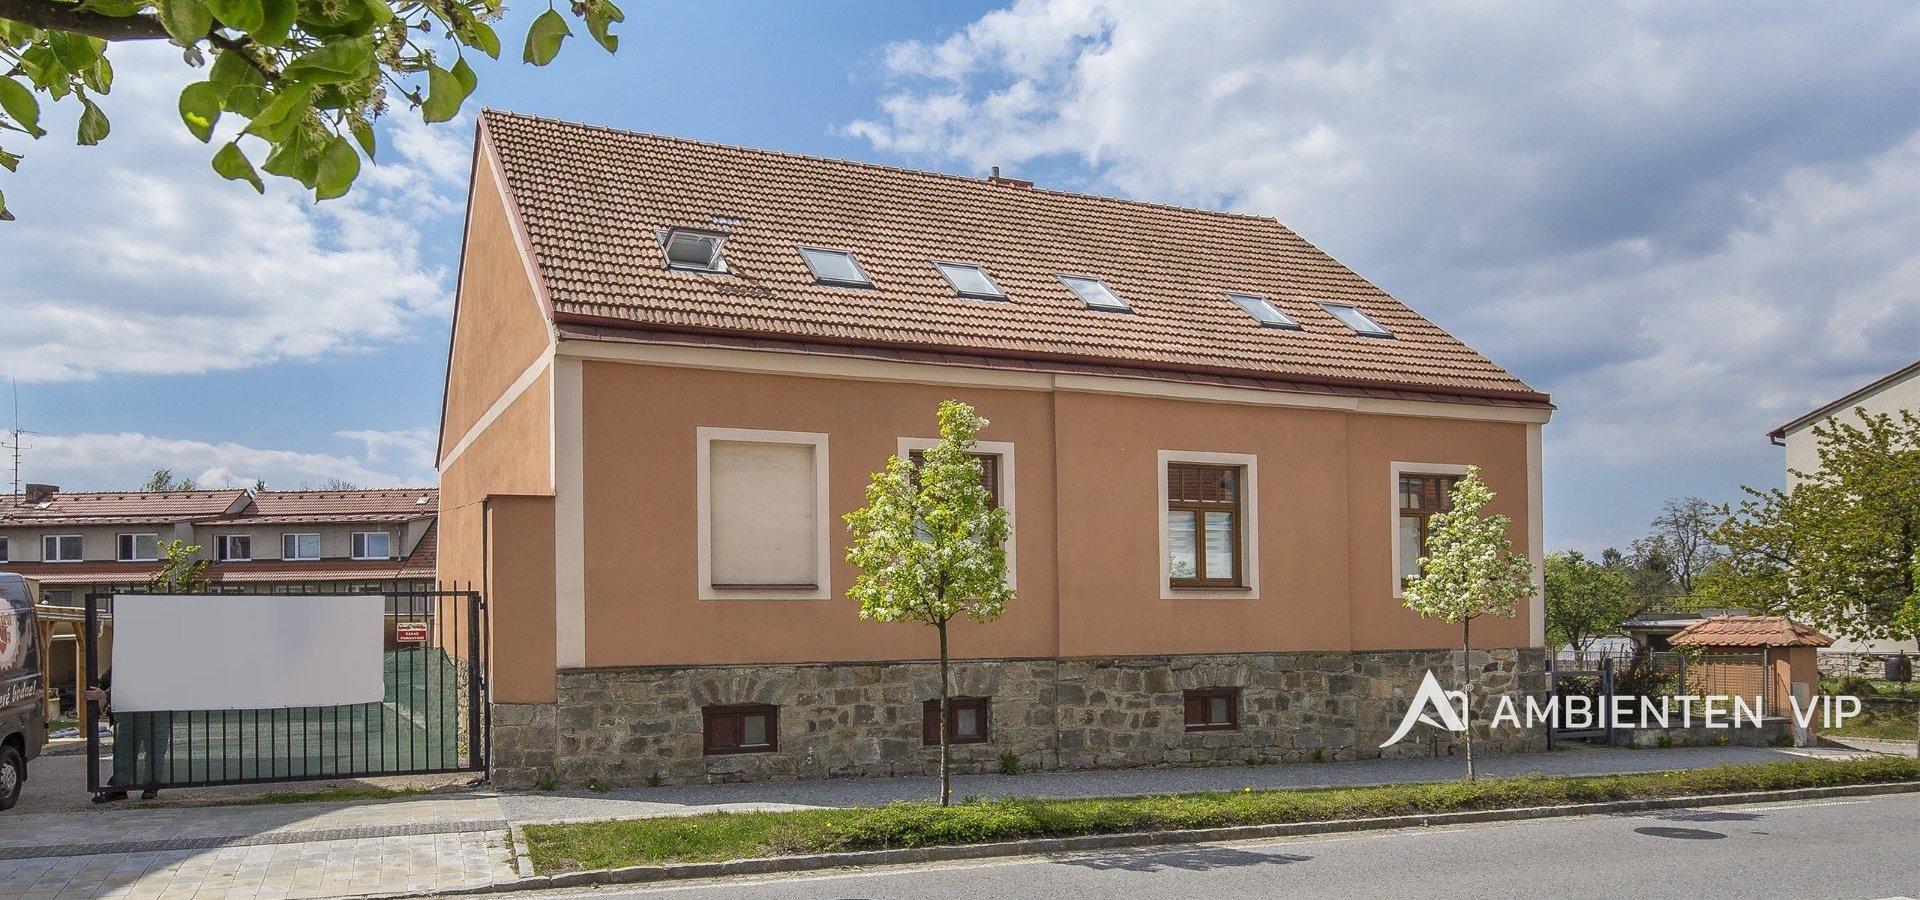 prodej-rodinneho-domu-na-bydleni-i-investici-477m2-telc-11merge-0b61c0